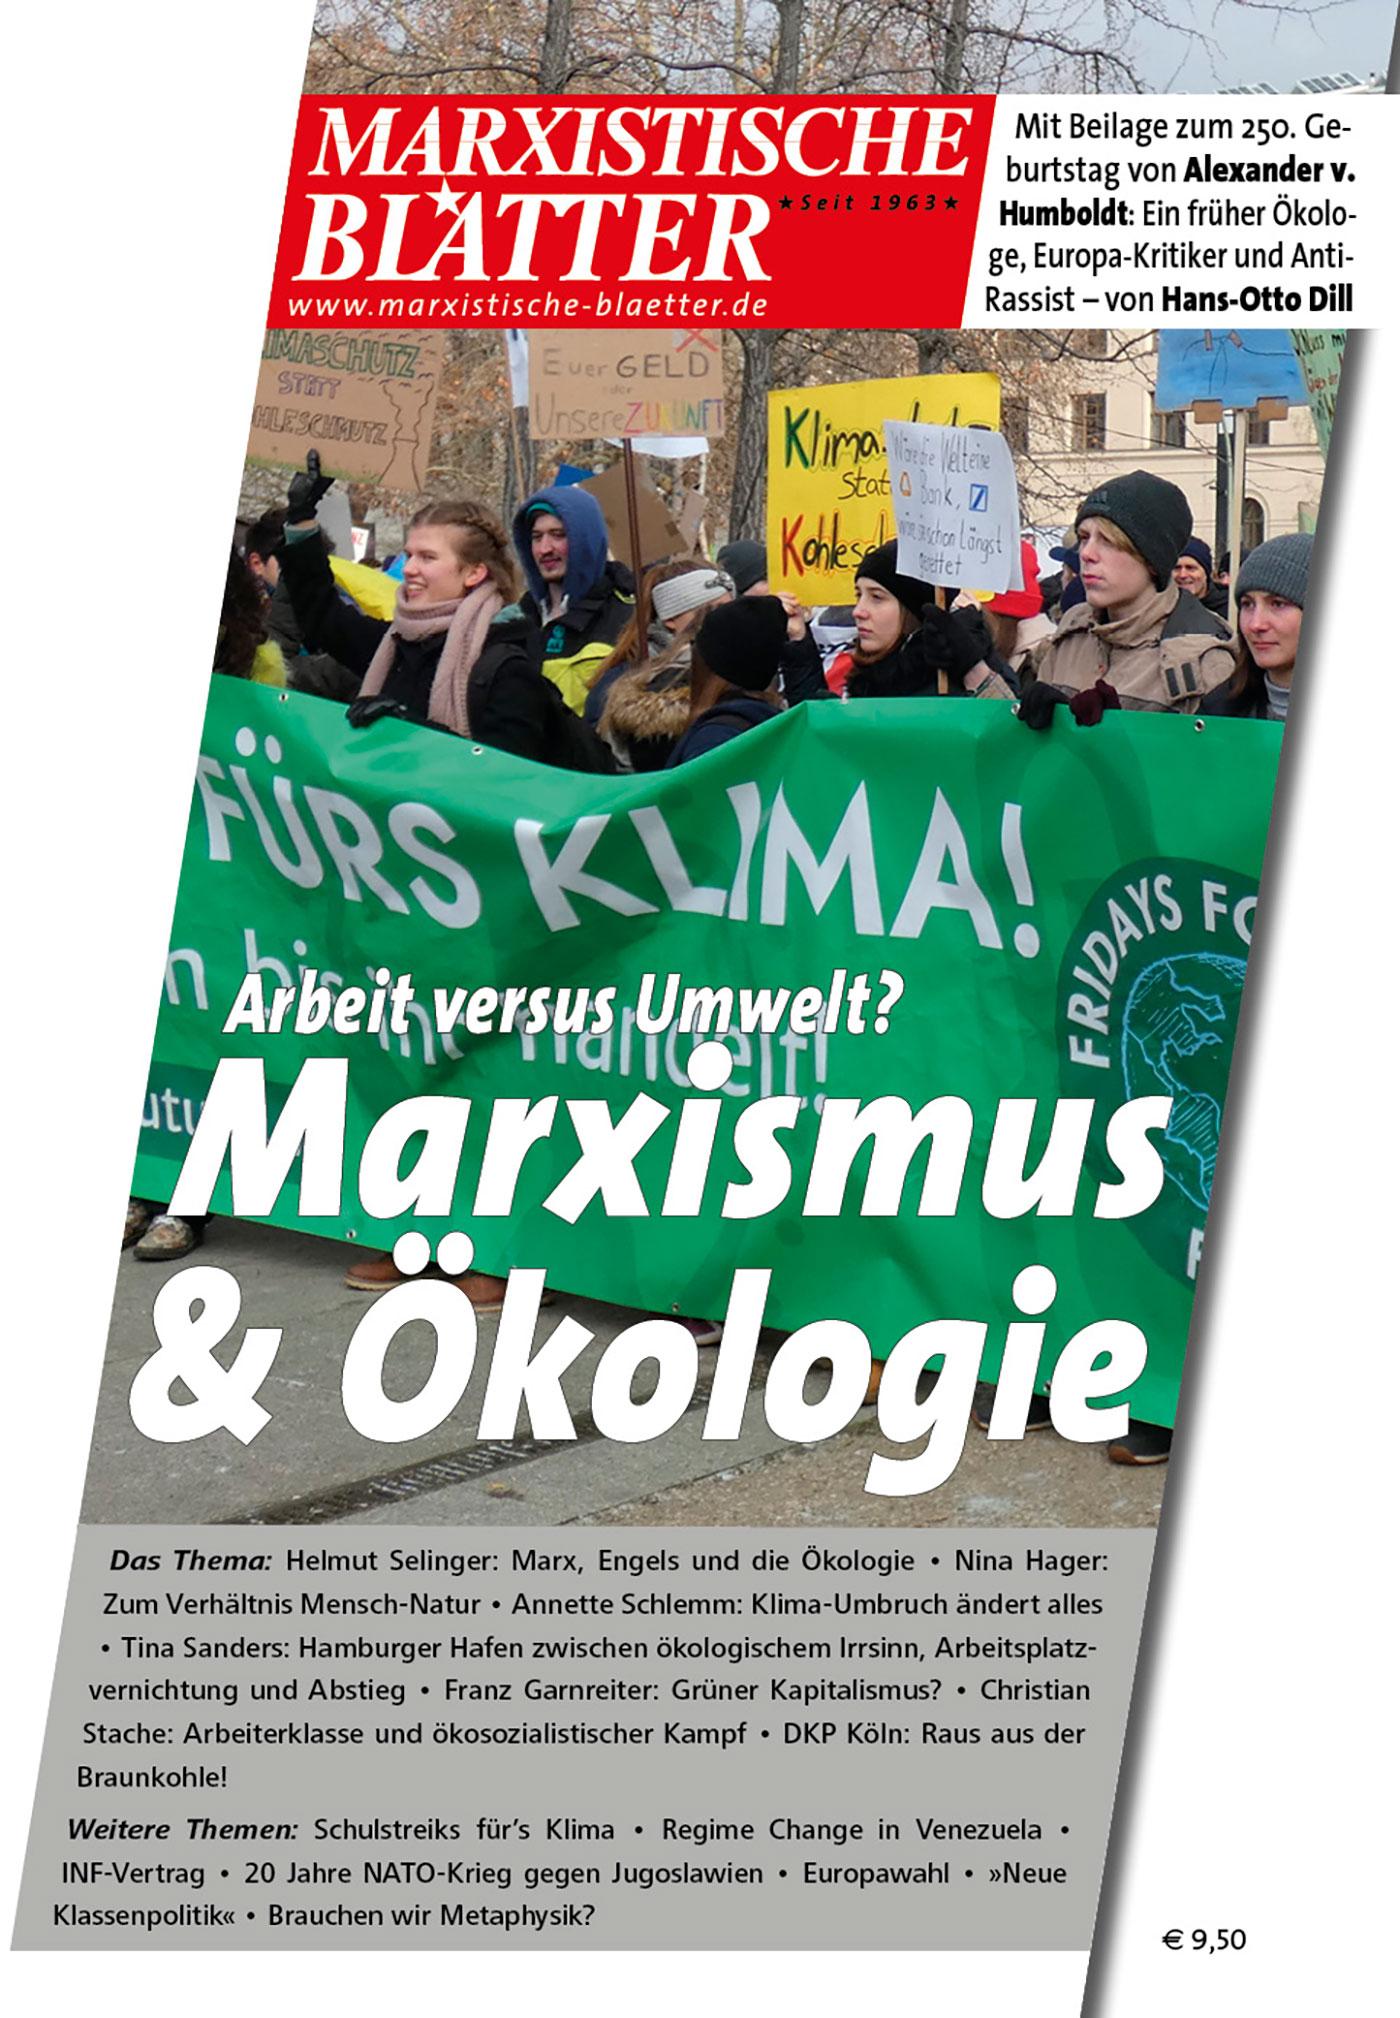 Marxismus & Ökologie